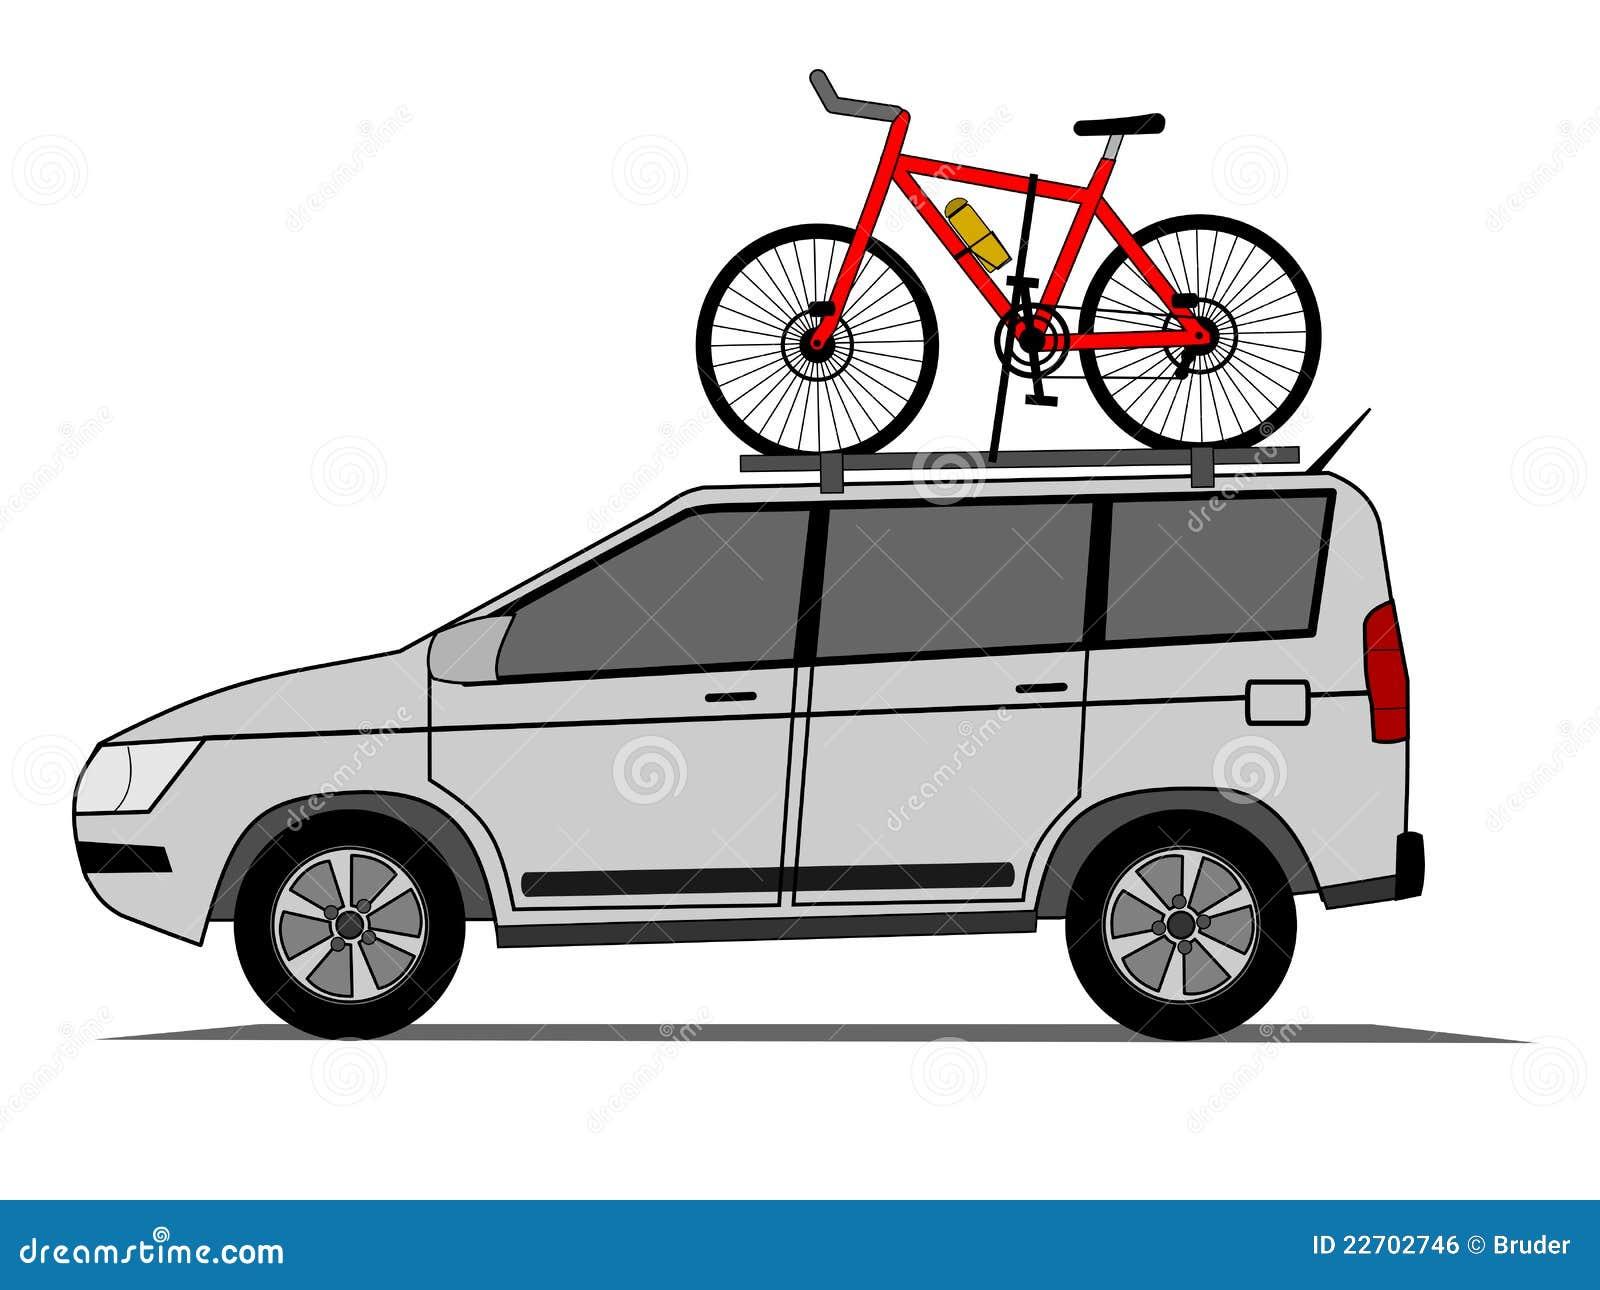 bike rack clip art - photo #30